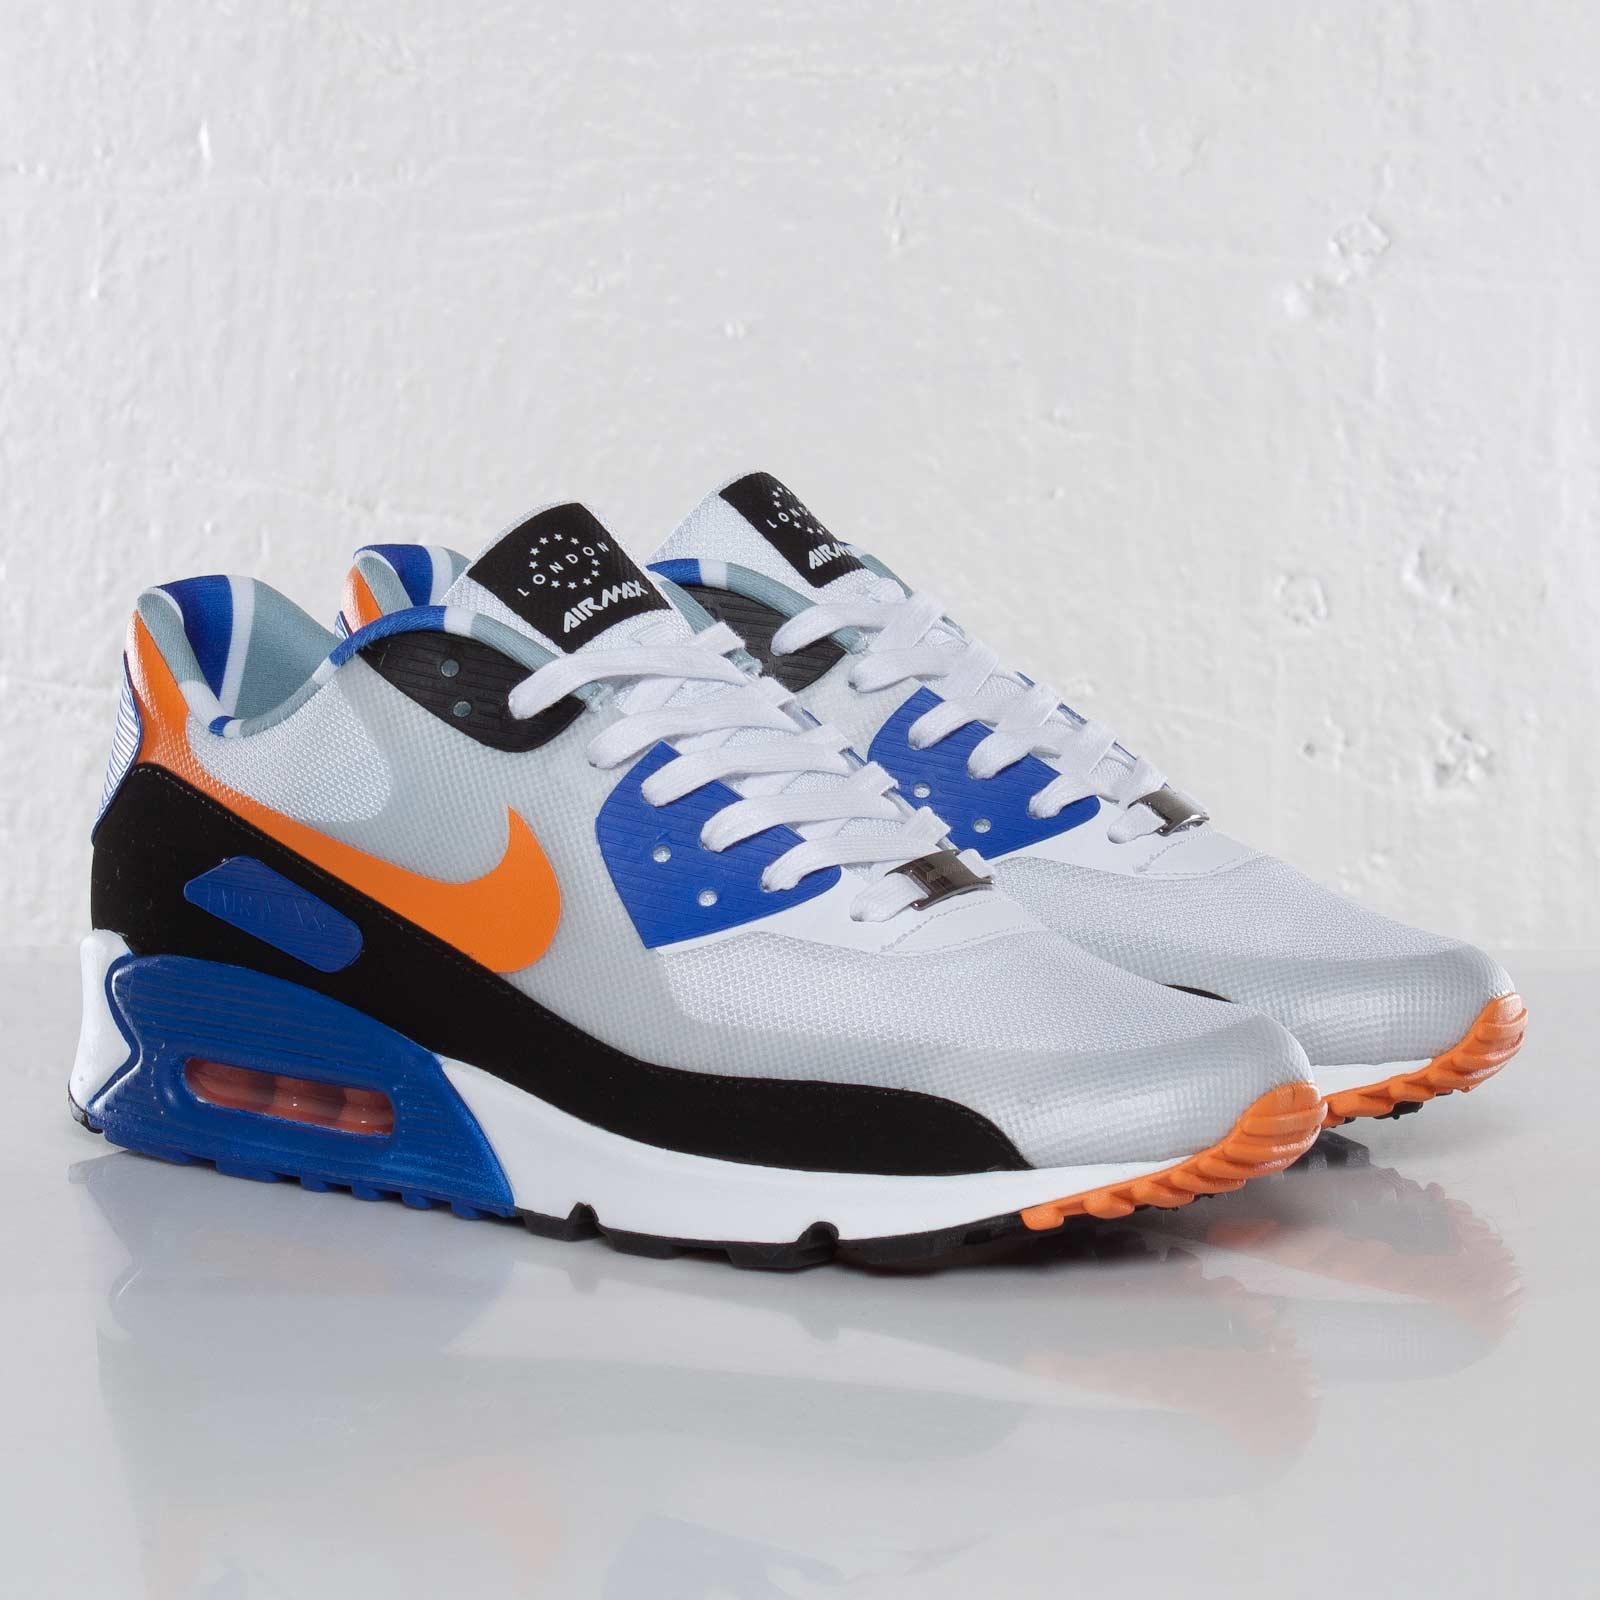 Nike Air Max 90 London QS - 586845-108 - SNS | sneakers ...